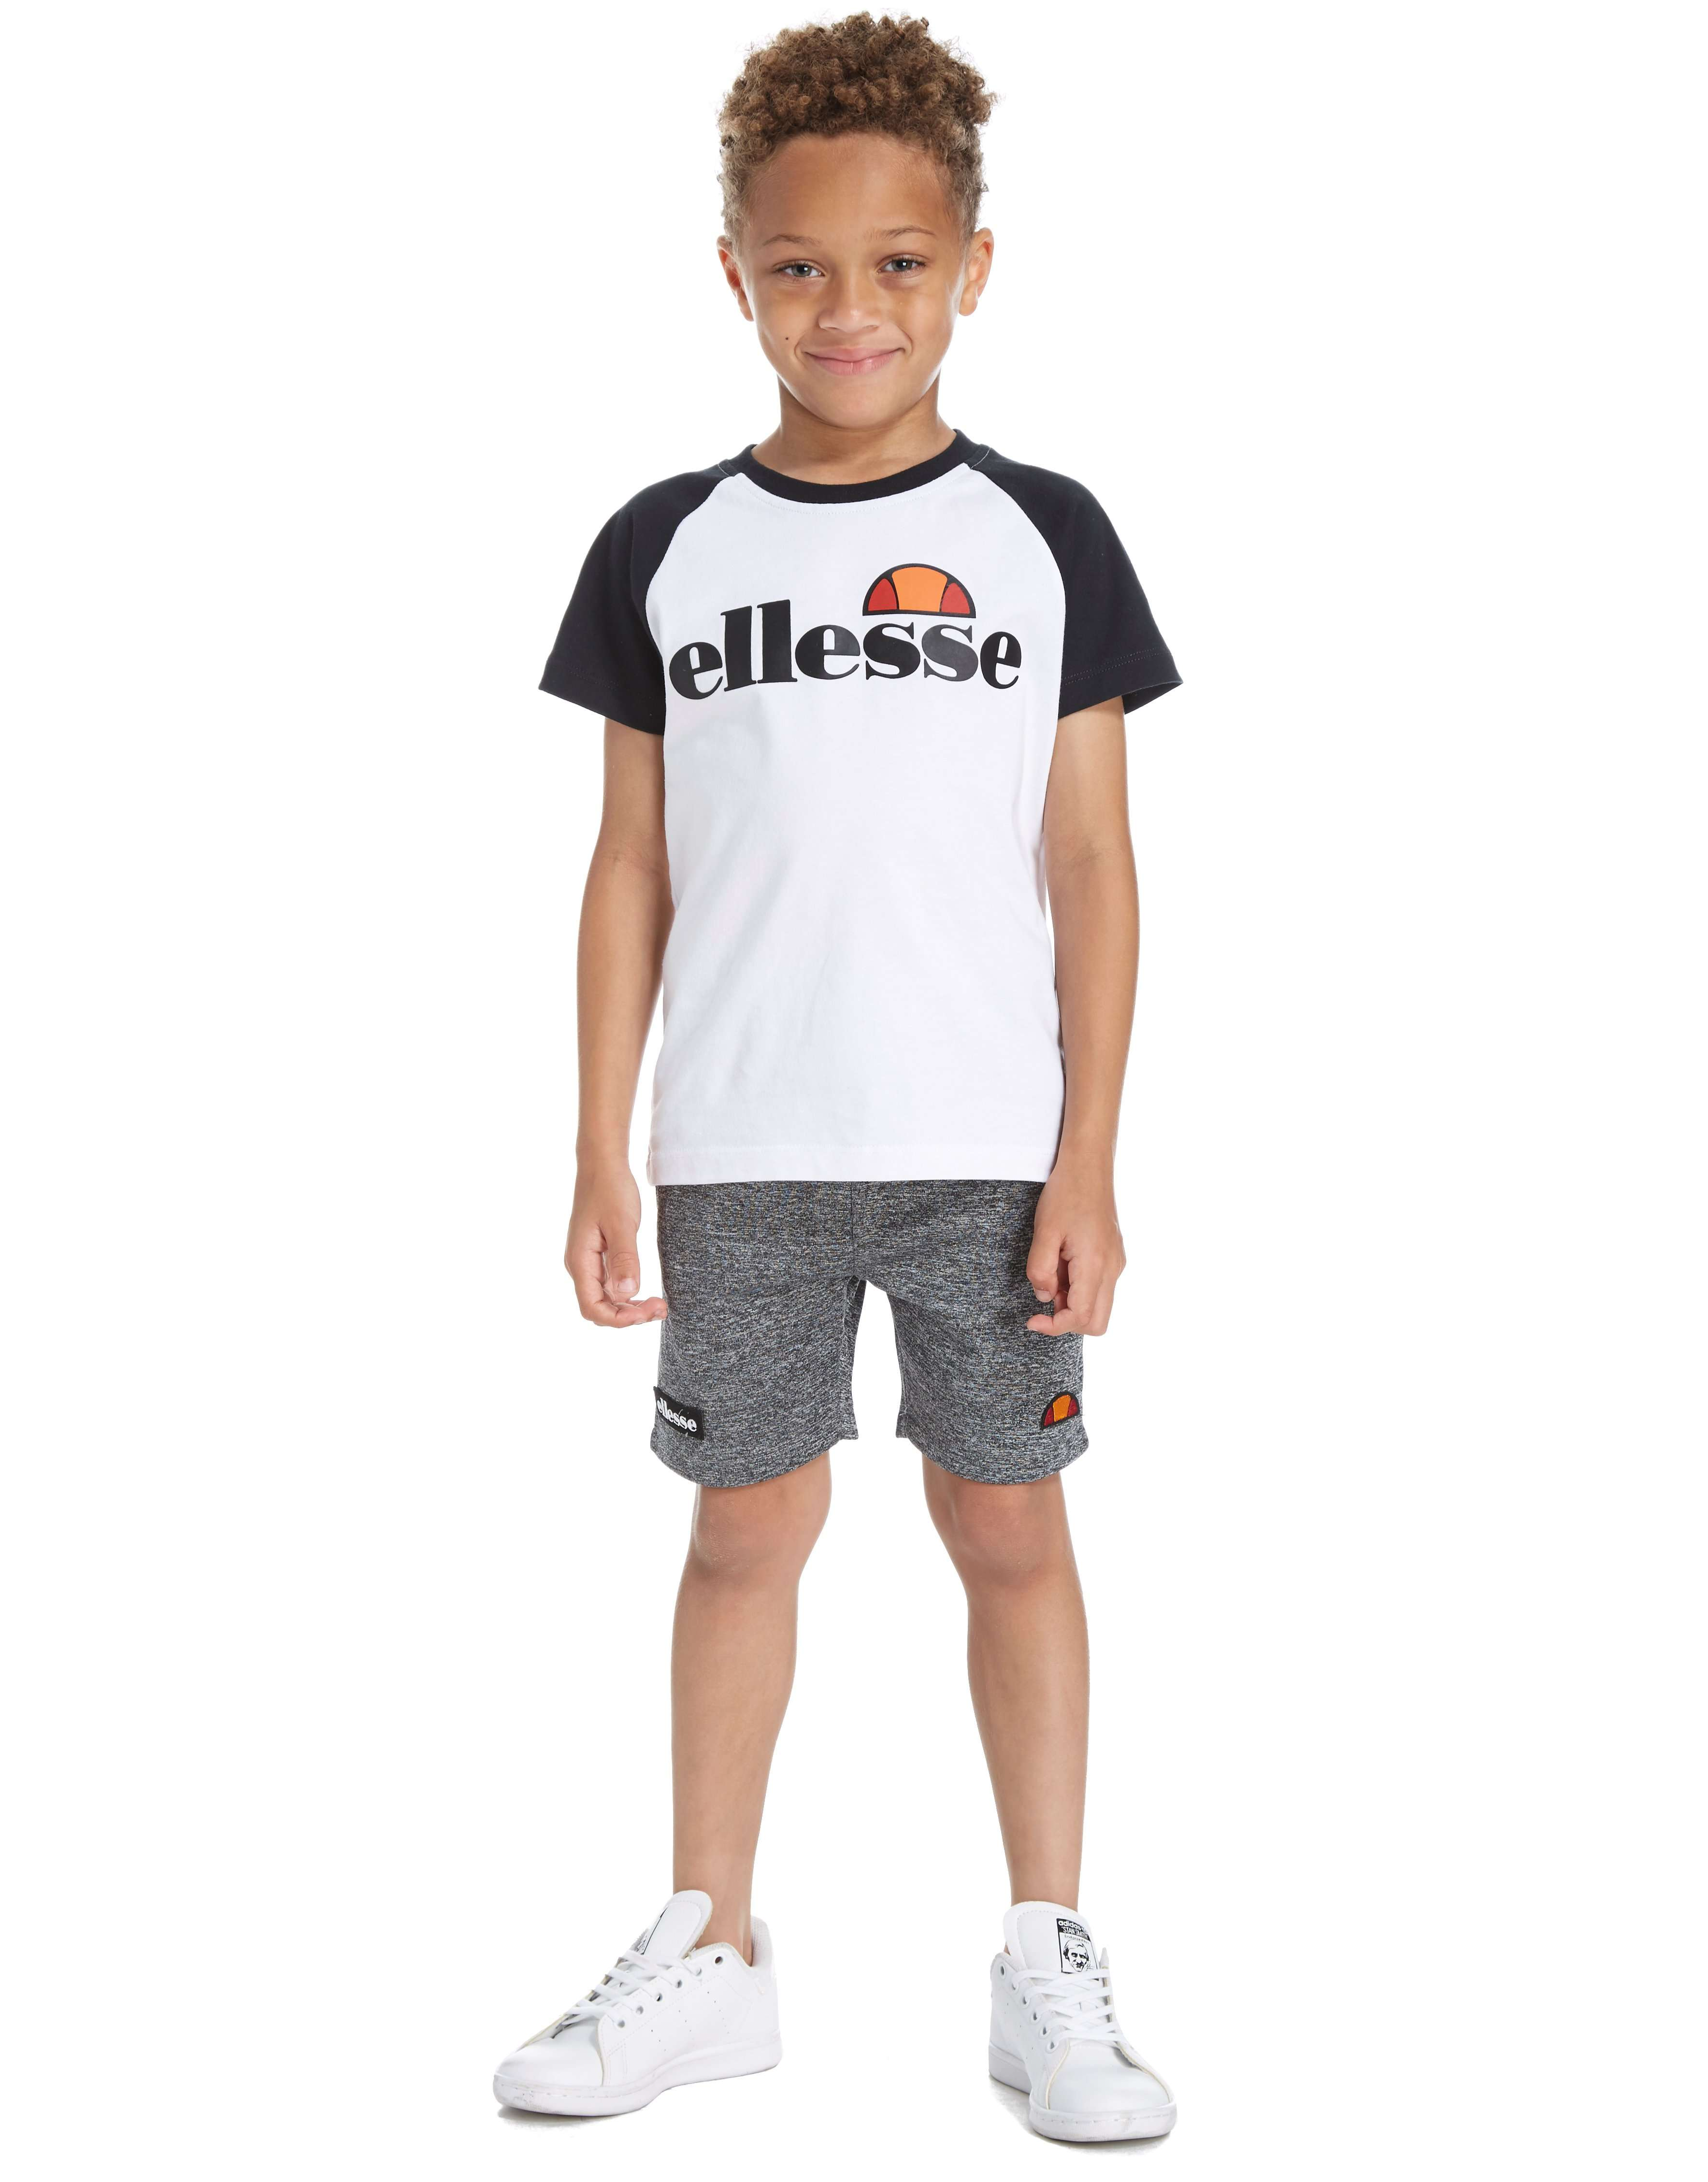 Ellesse Strega Shorts Children